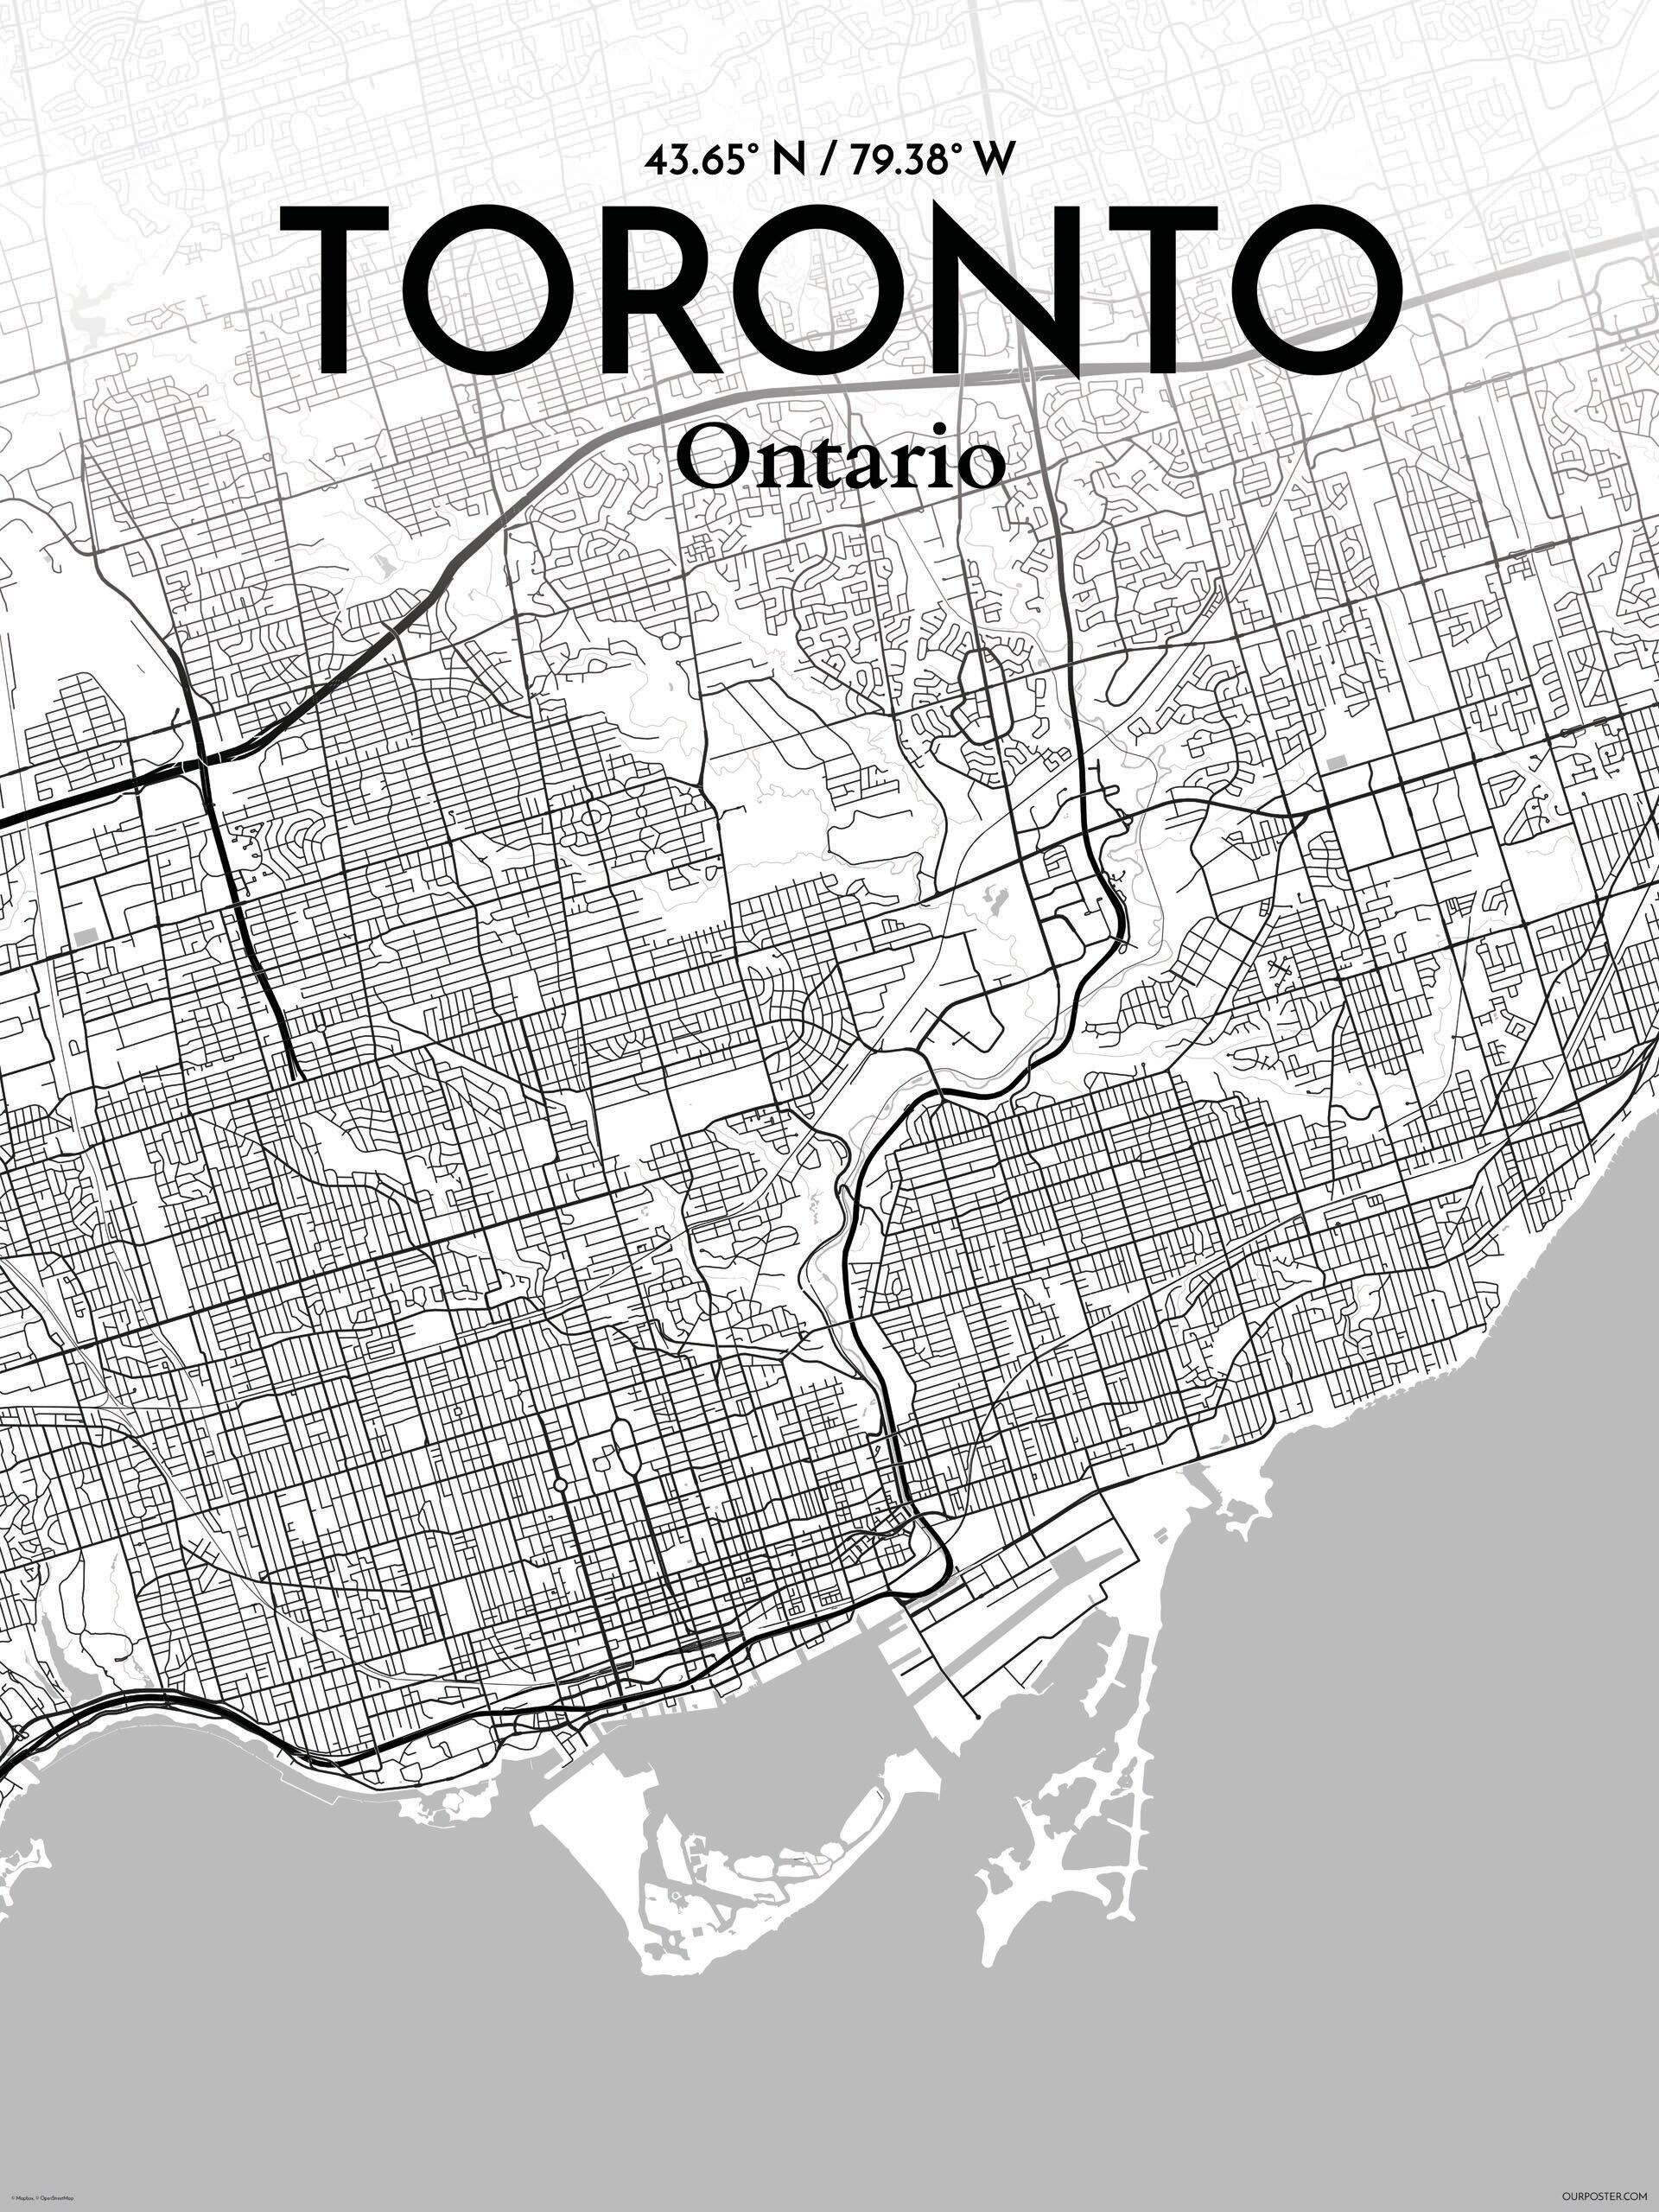 Ourposter toronto city map graphic art print poster in tones ourposter toronto city map graphic art print poster in tones wayfair gumiabroncs Choice Image